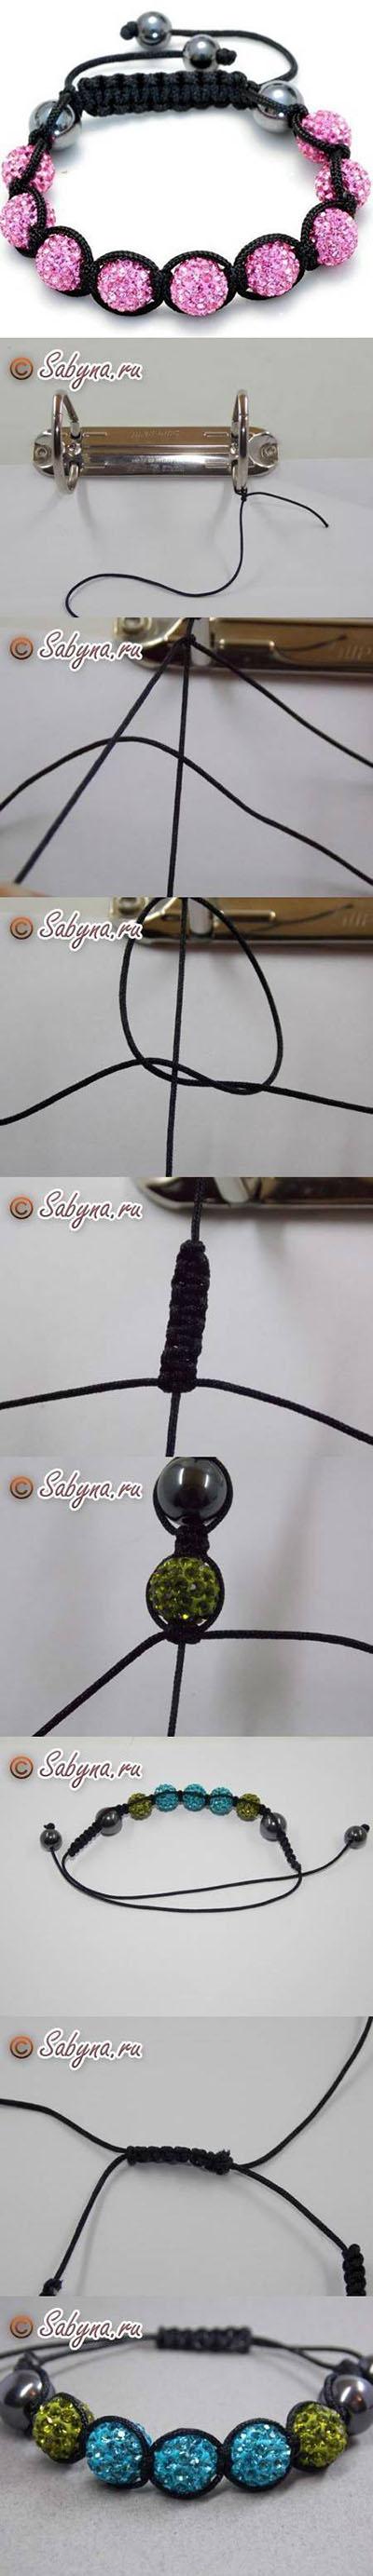 DIY-Bright-Beads-Bracelet11